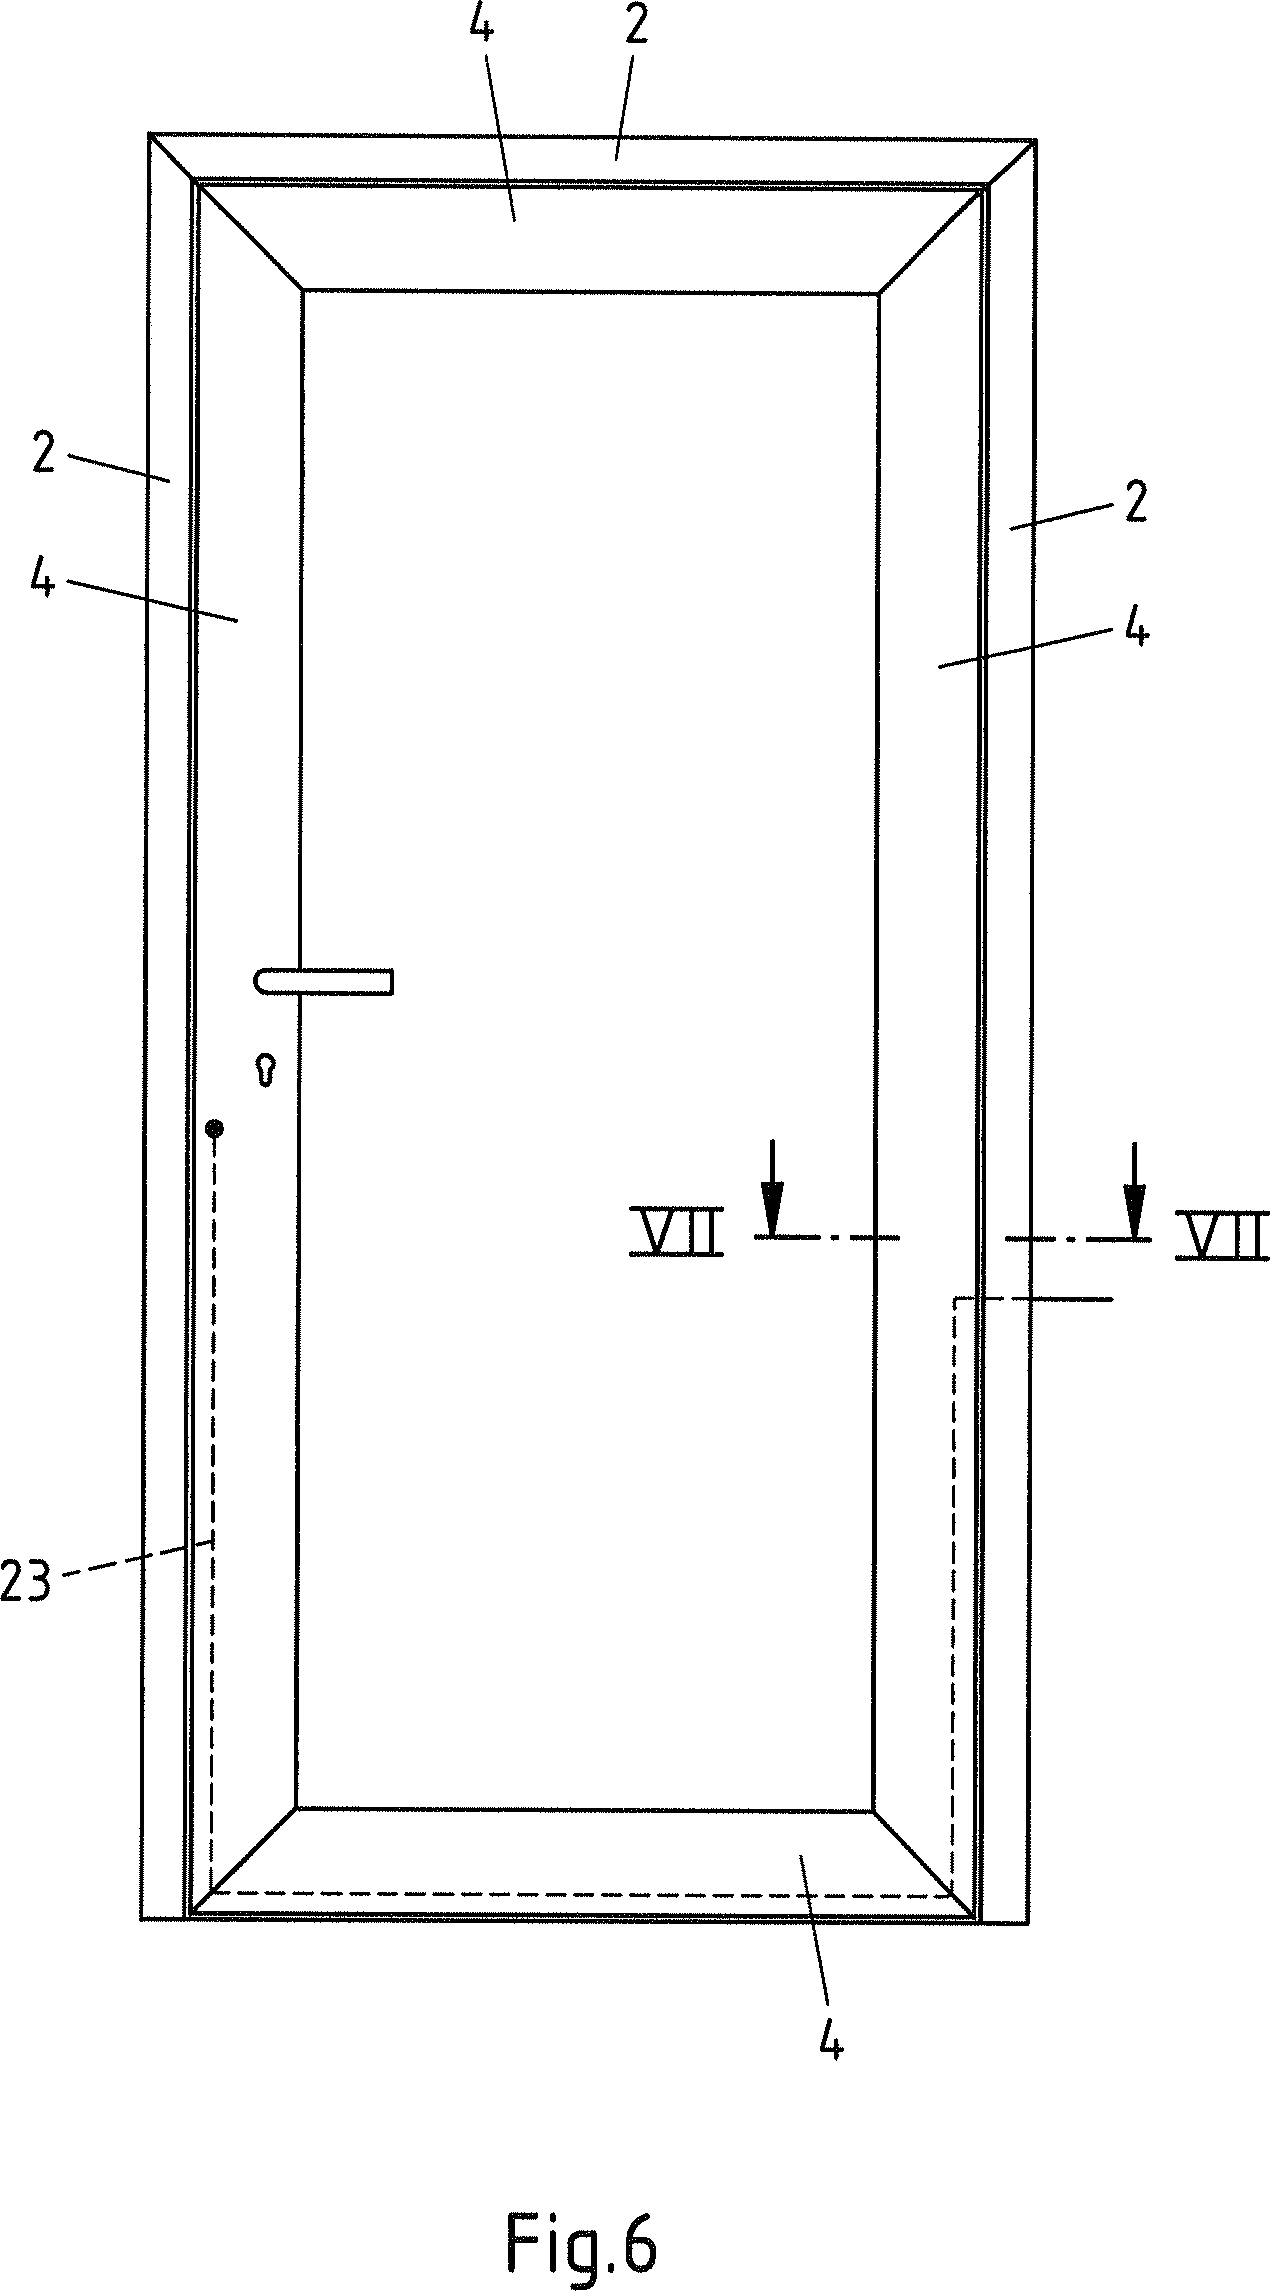 Haustür vertikalschnitt  Patente DE102012111005A1 - Tür, insbesondere Aluminium-Haustür ...